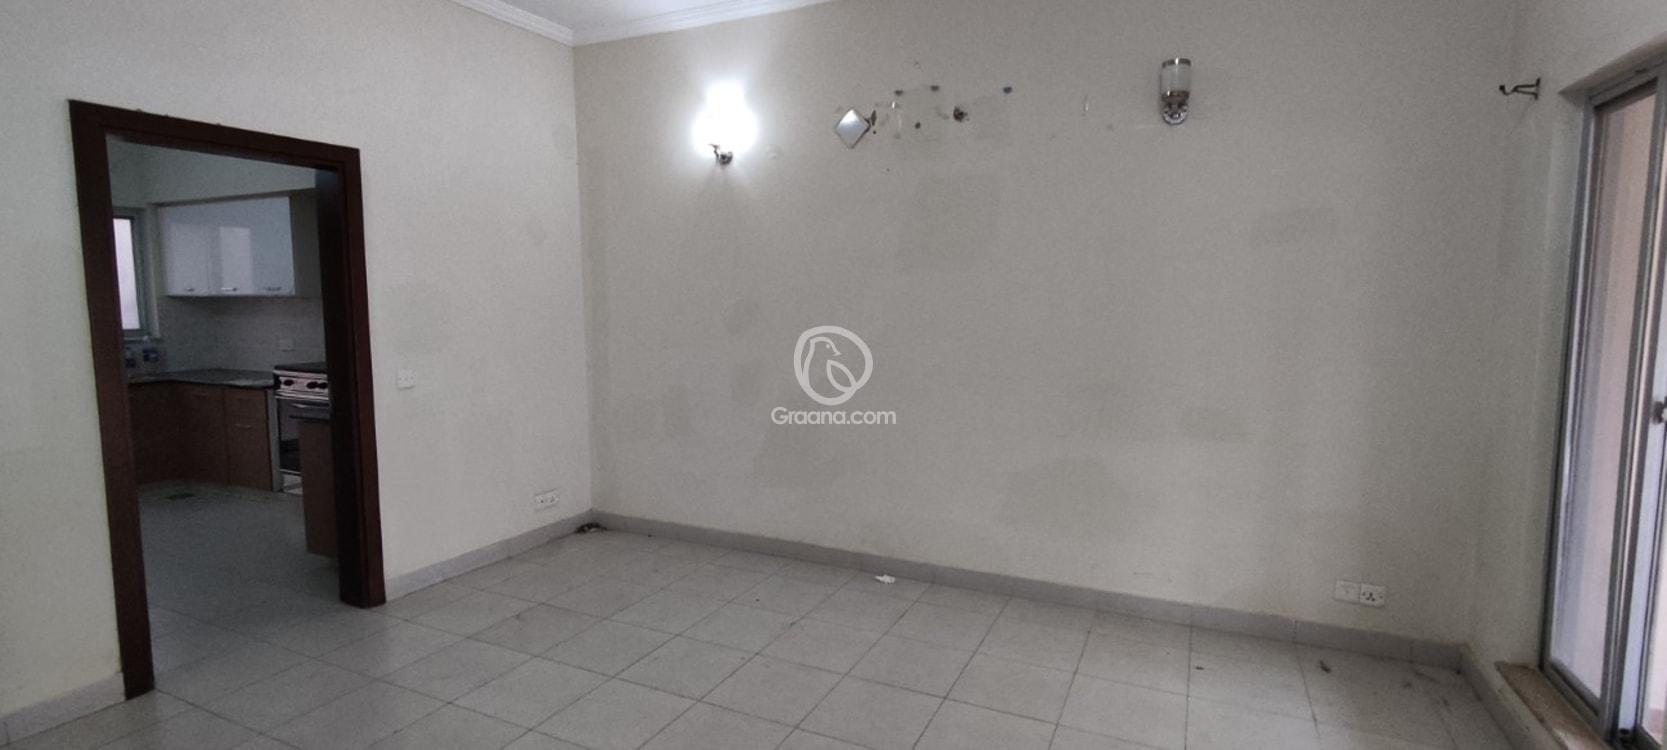 152 Sqyd House for Sale  | Graana.com